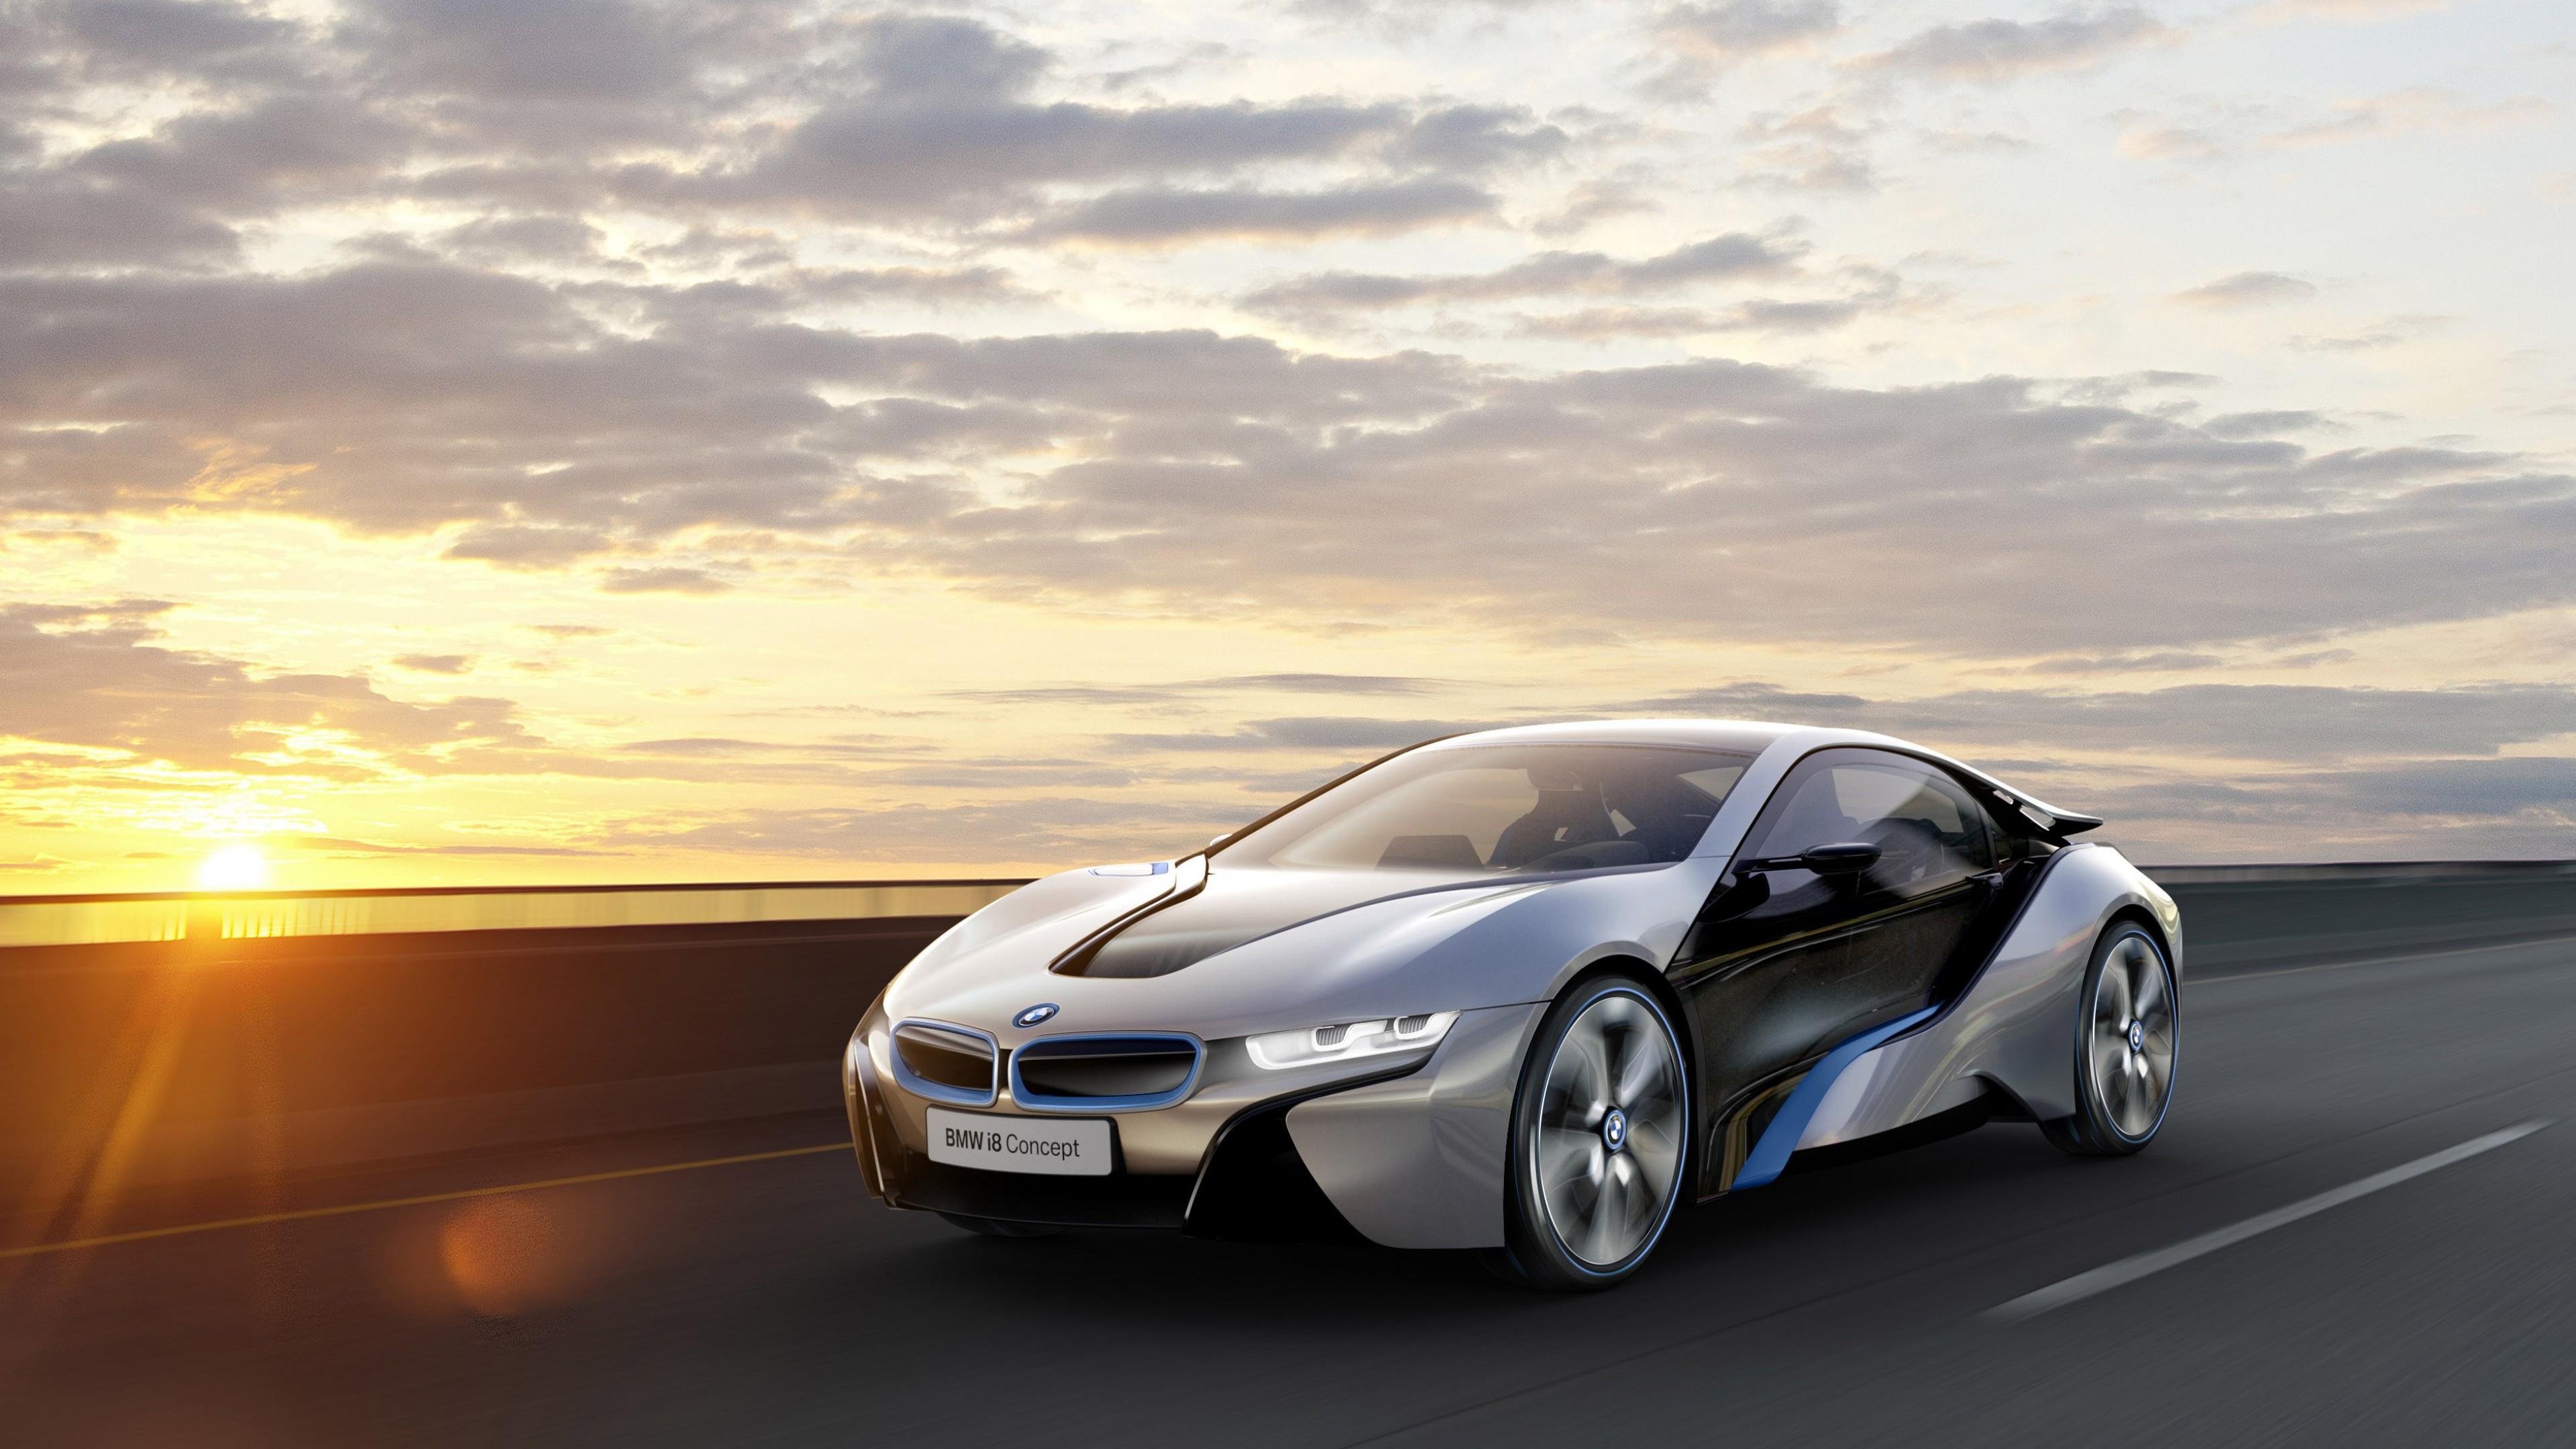 Wallpaper BMW i8 4k HD wallpaper electric cars MCV carbon 3840x2160